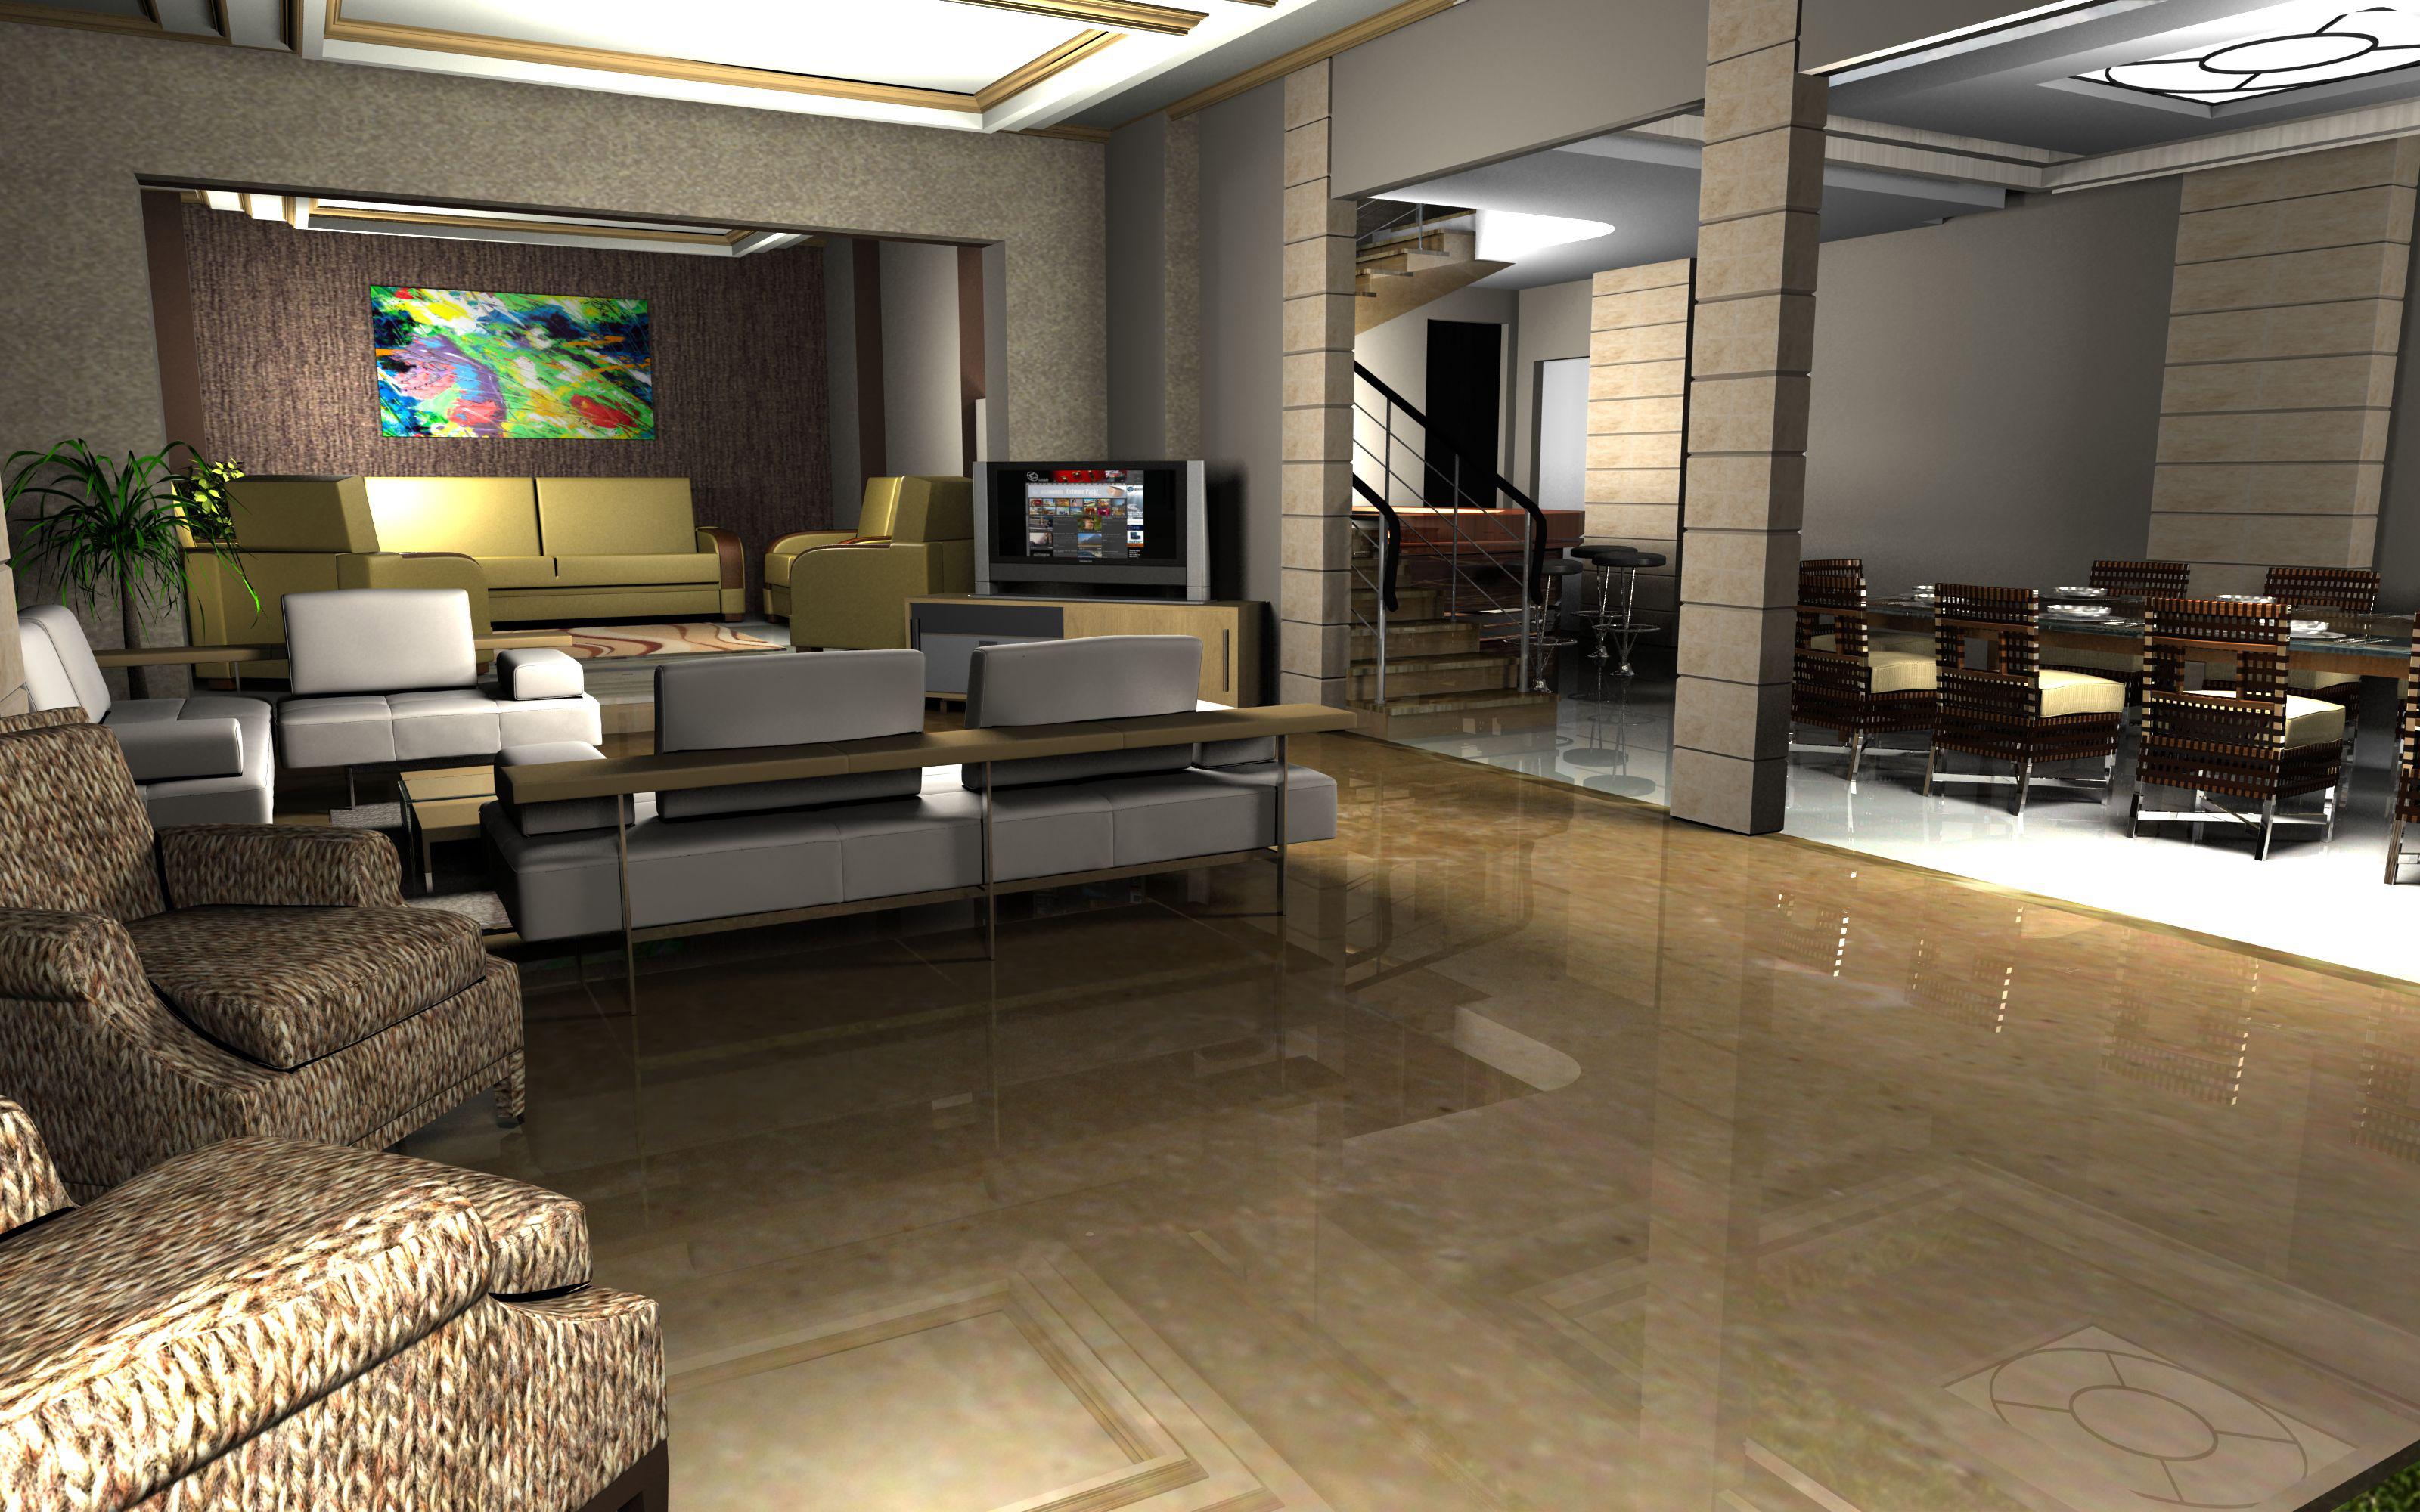 Villa khalid in jumeirah by vic nopuente at for Best modern villa interior design